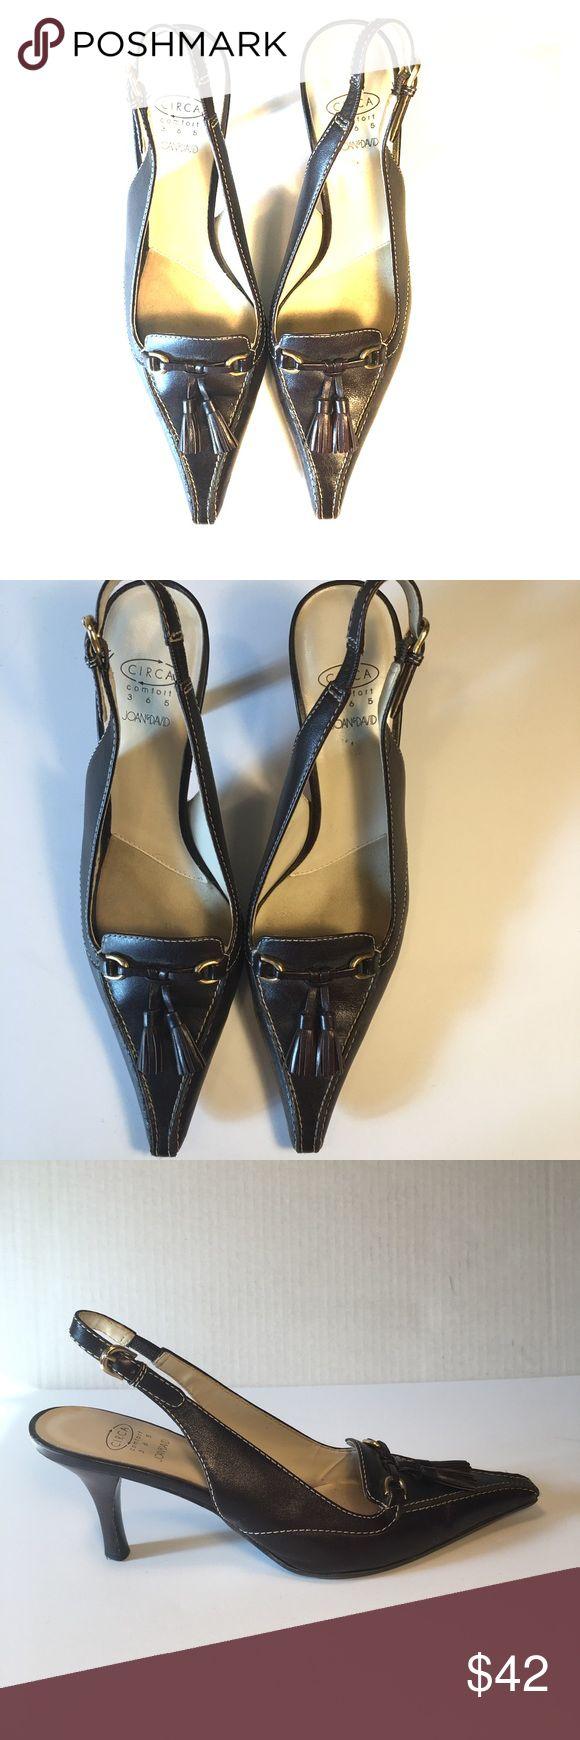 Joan & David sling back shoe Joan & David chestnut brown beautiful sling back heal shoe. Great condition . Joan & David Shoes Heels